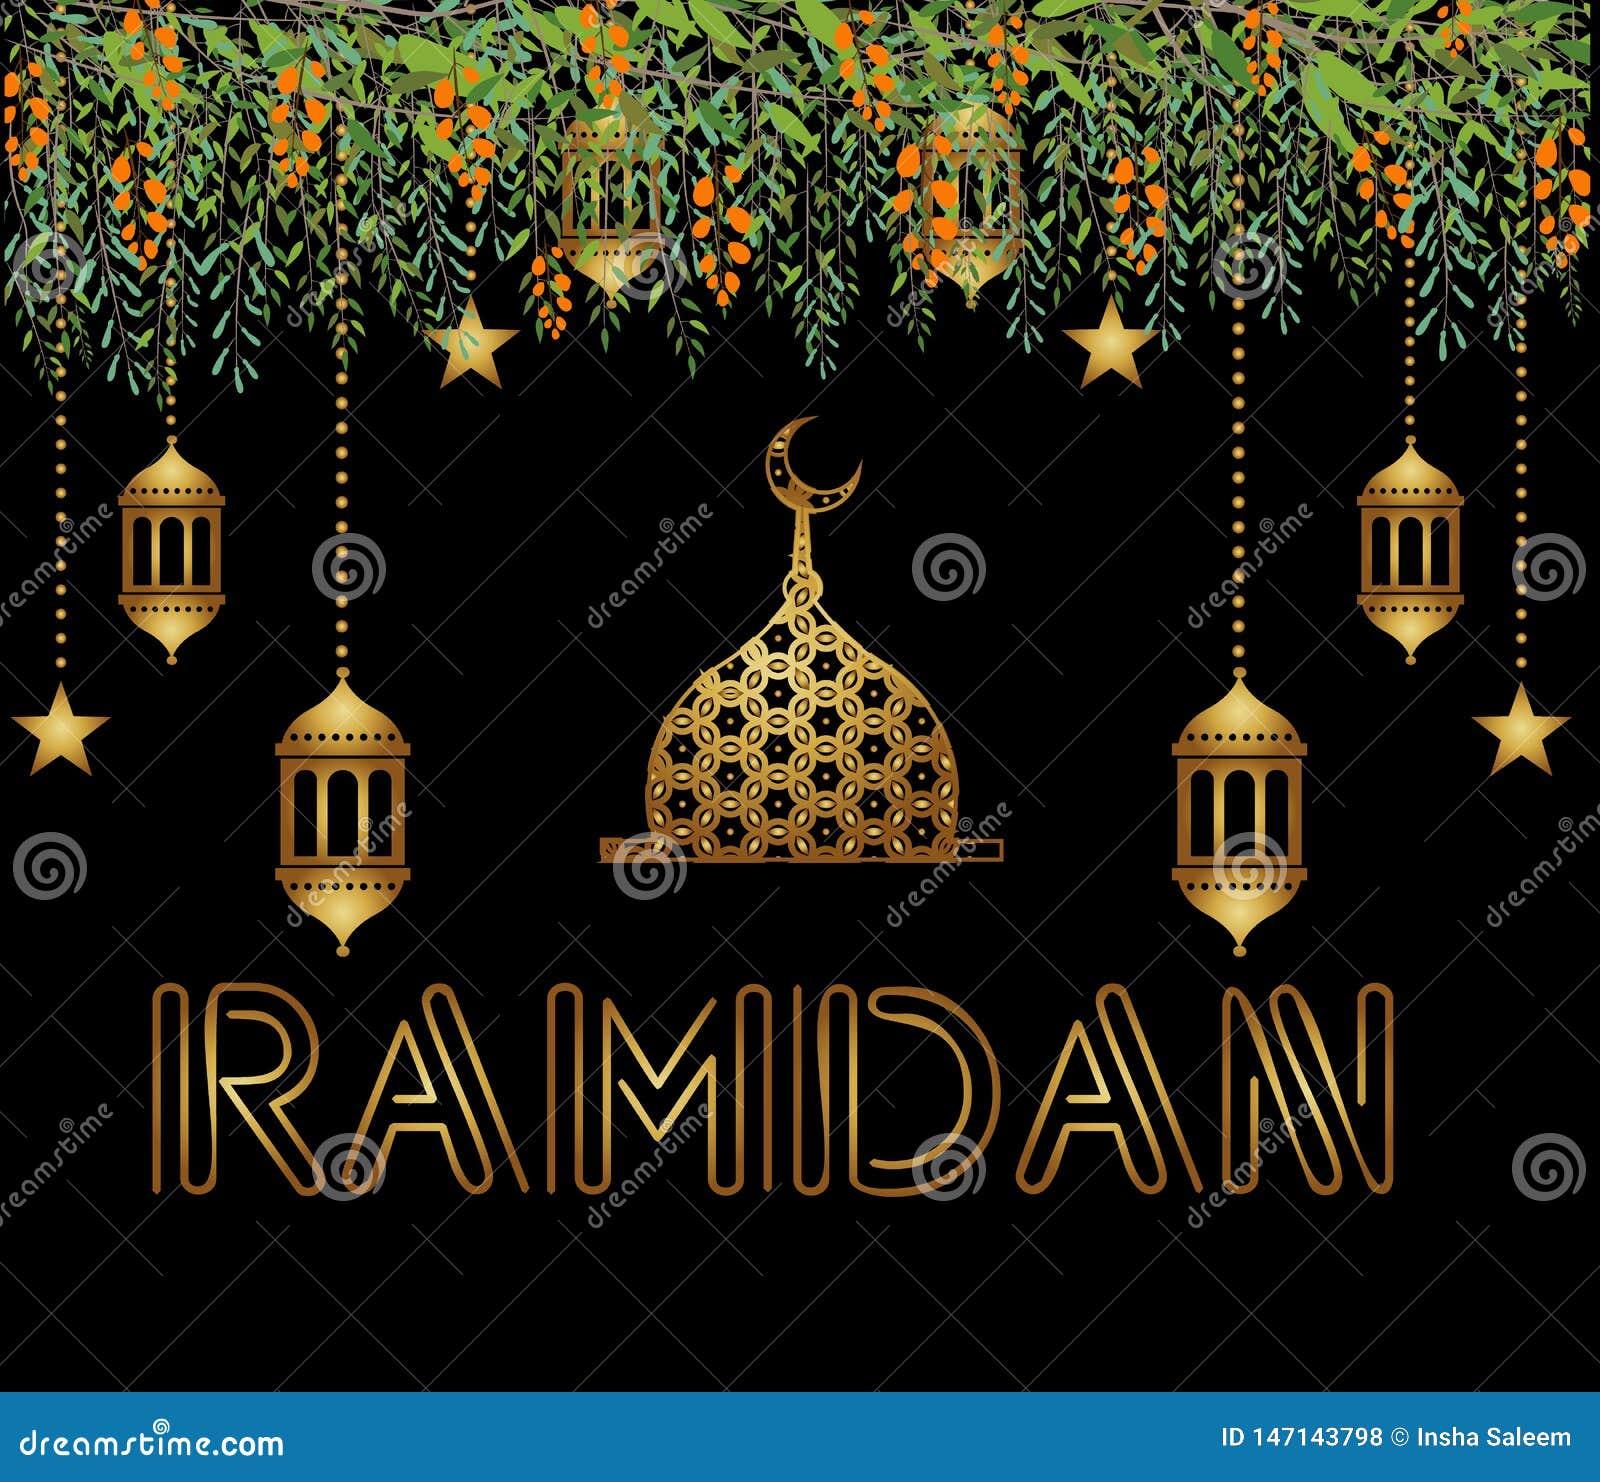 Ramadan Kareem Vector Background Illustration bello